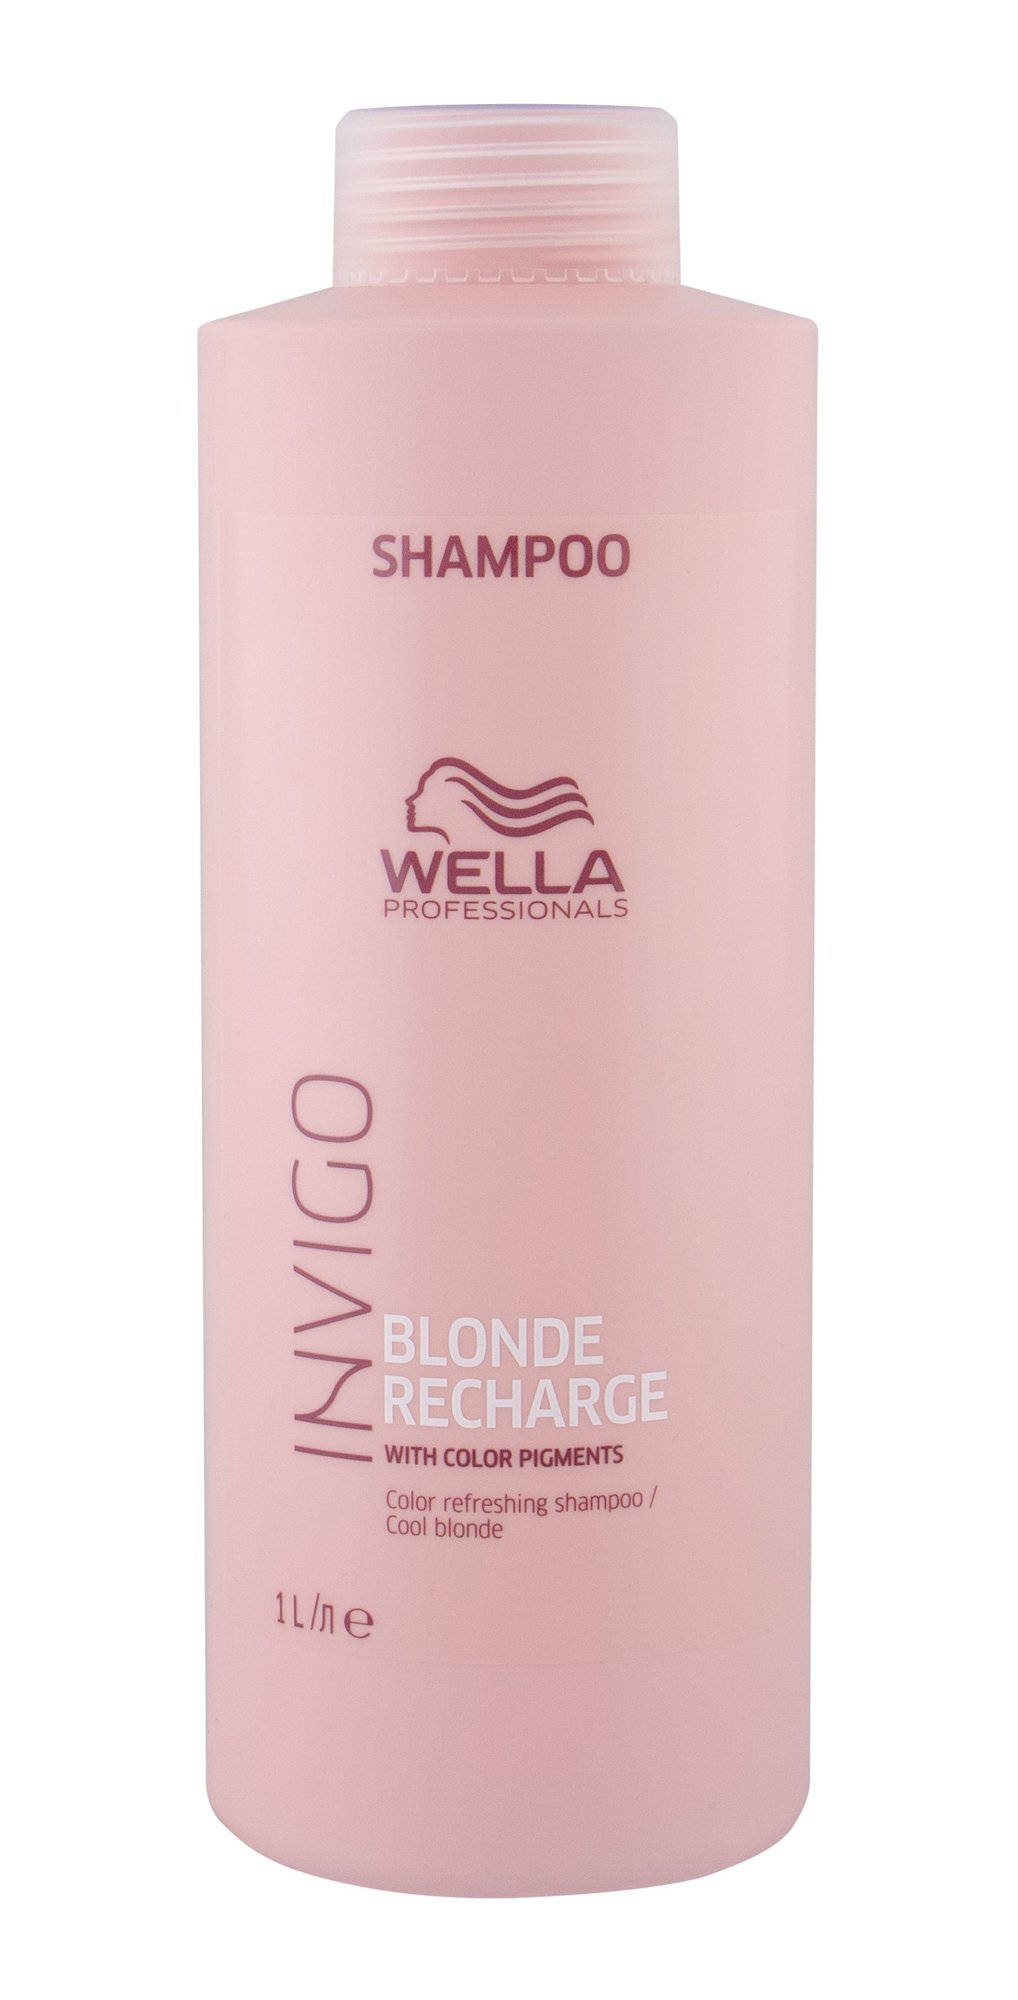 Wella Invigo Shampoo 1000ml Cool Blonde